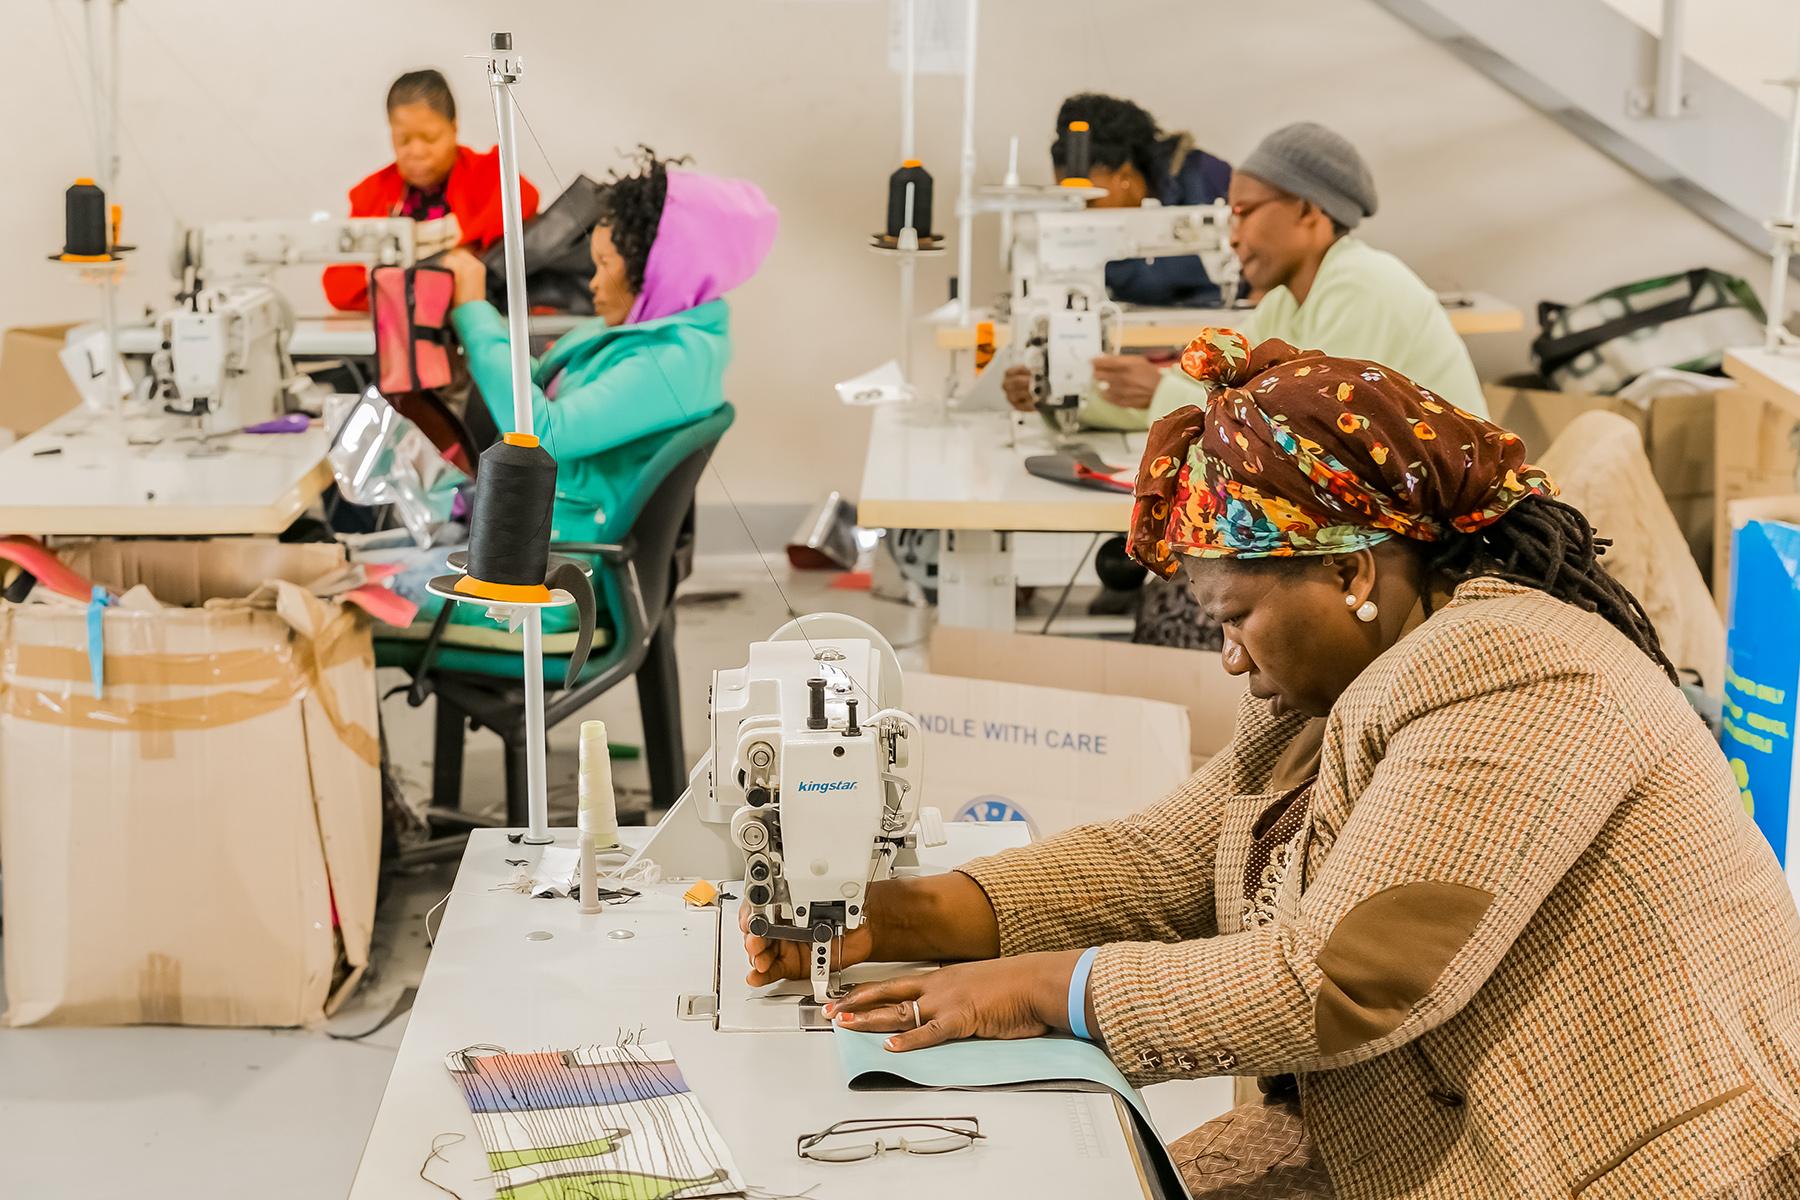 Seamstresses preparing garments in South Africa